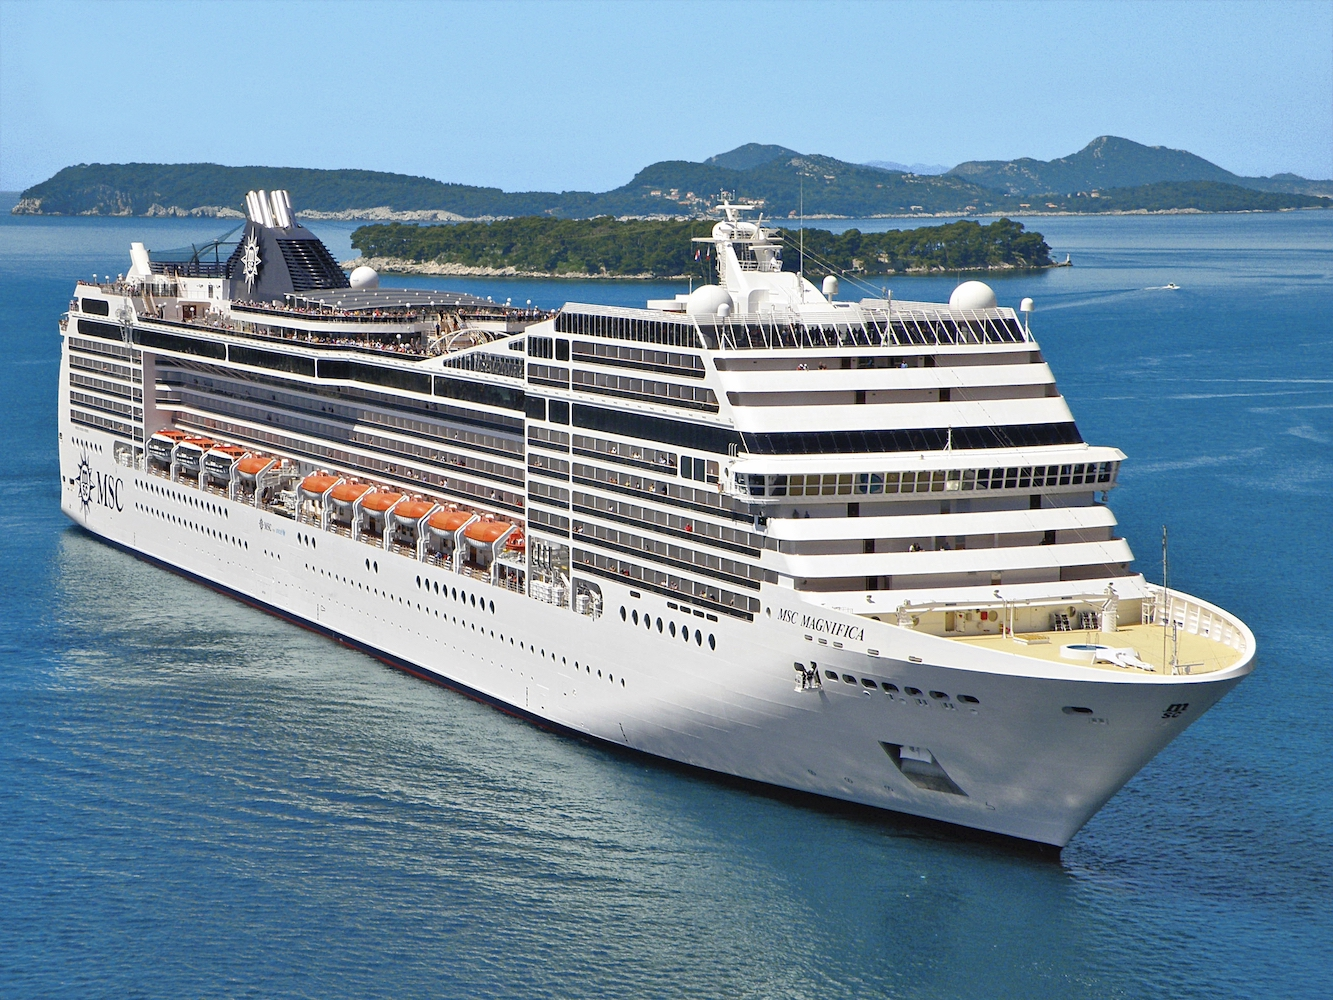 World of Cruising Magazine - MSC Cruises is Offering 24